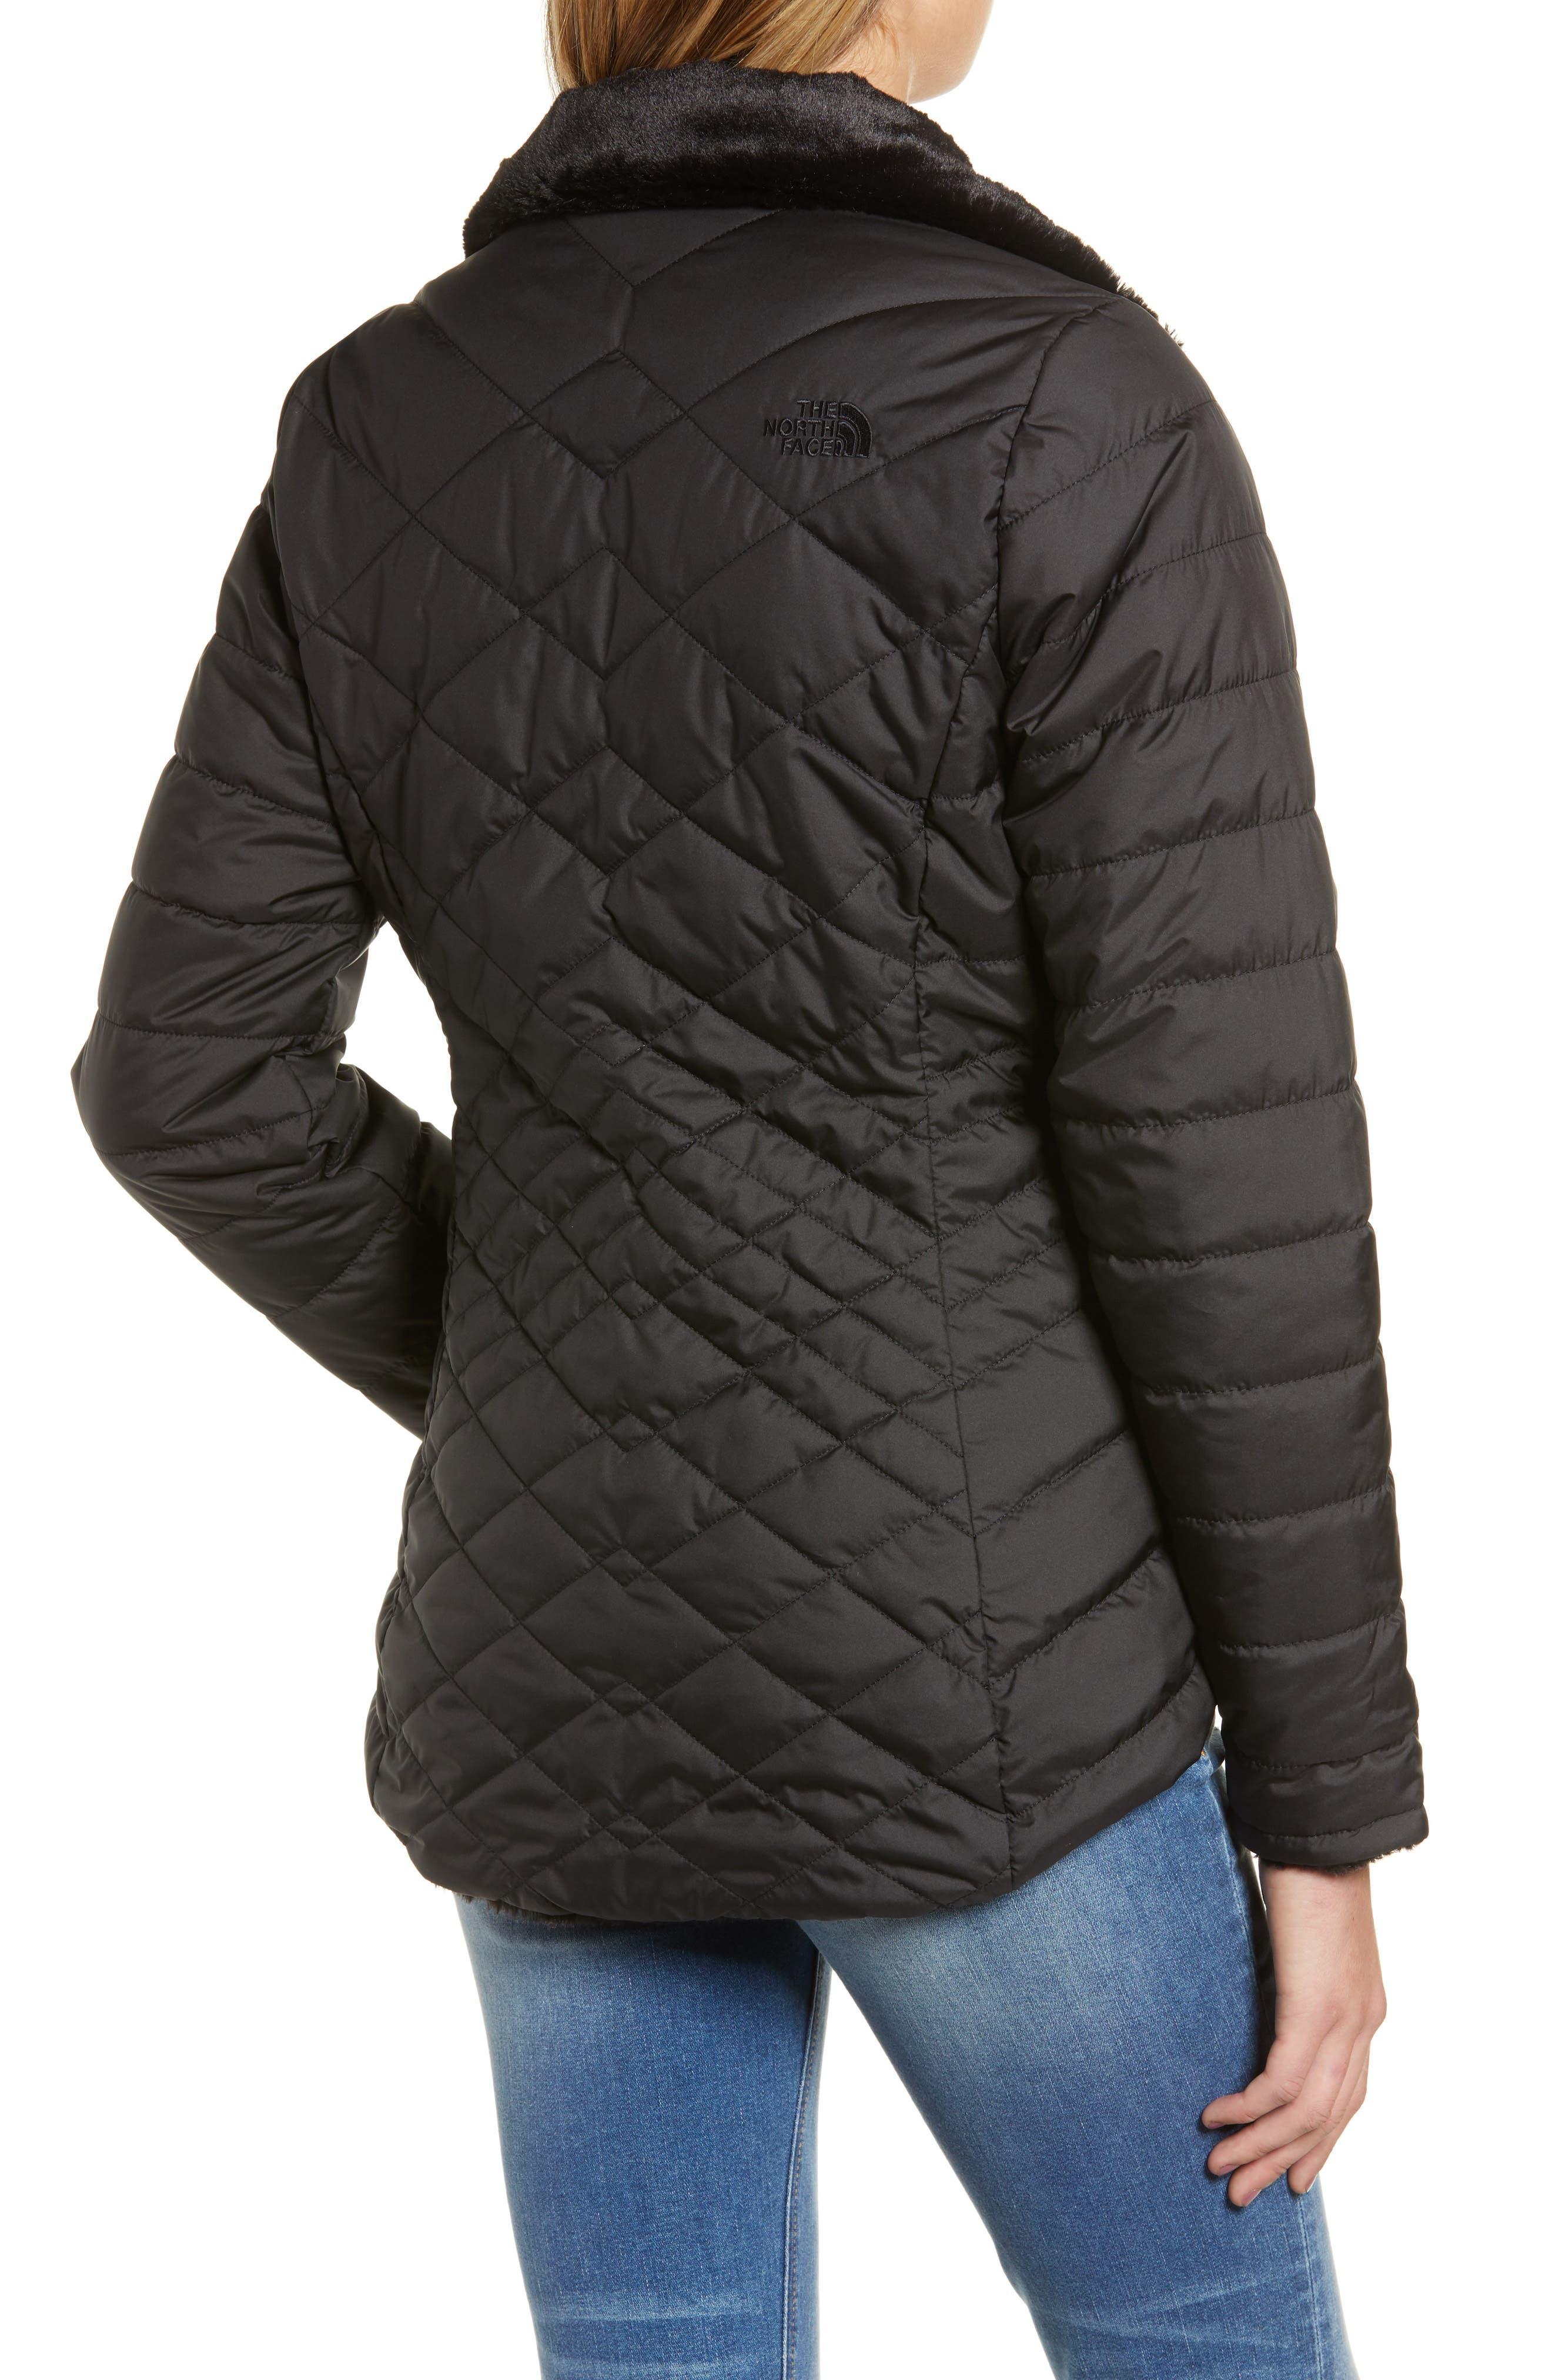 THE NORTH FACE, Mossbud Reversible Heatseeker<sup>™</sup> Wind Resistant Jacket, Alternate thumbnail 2, color, TNF BLACK